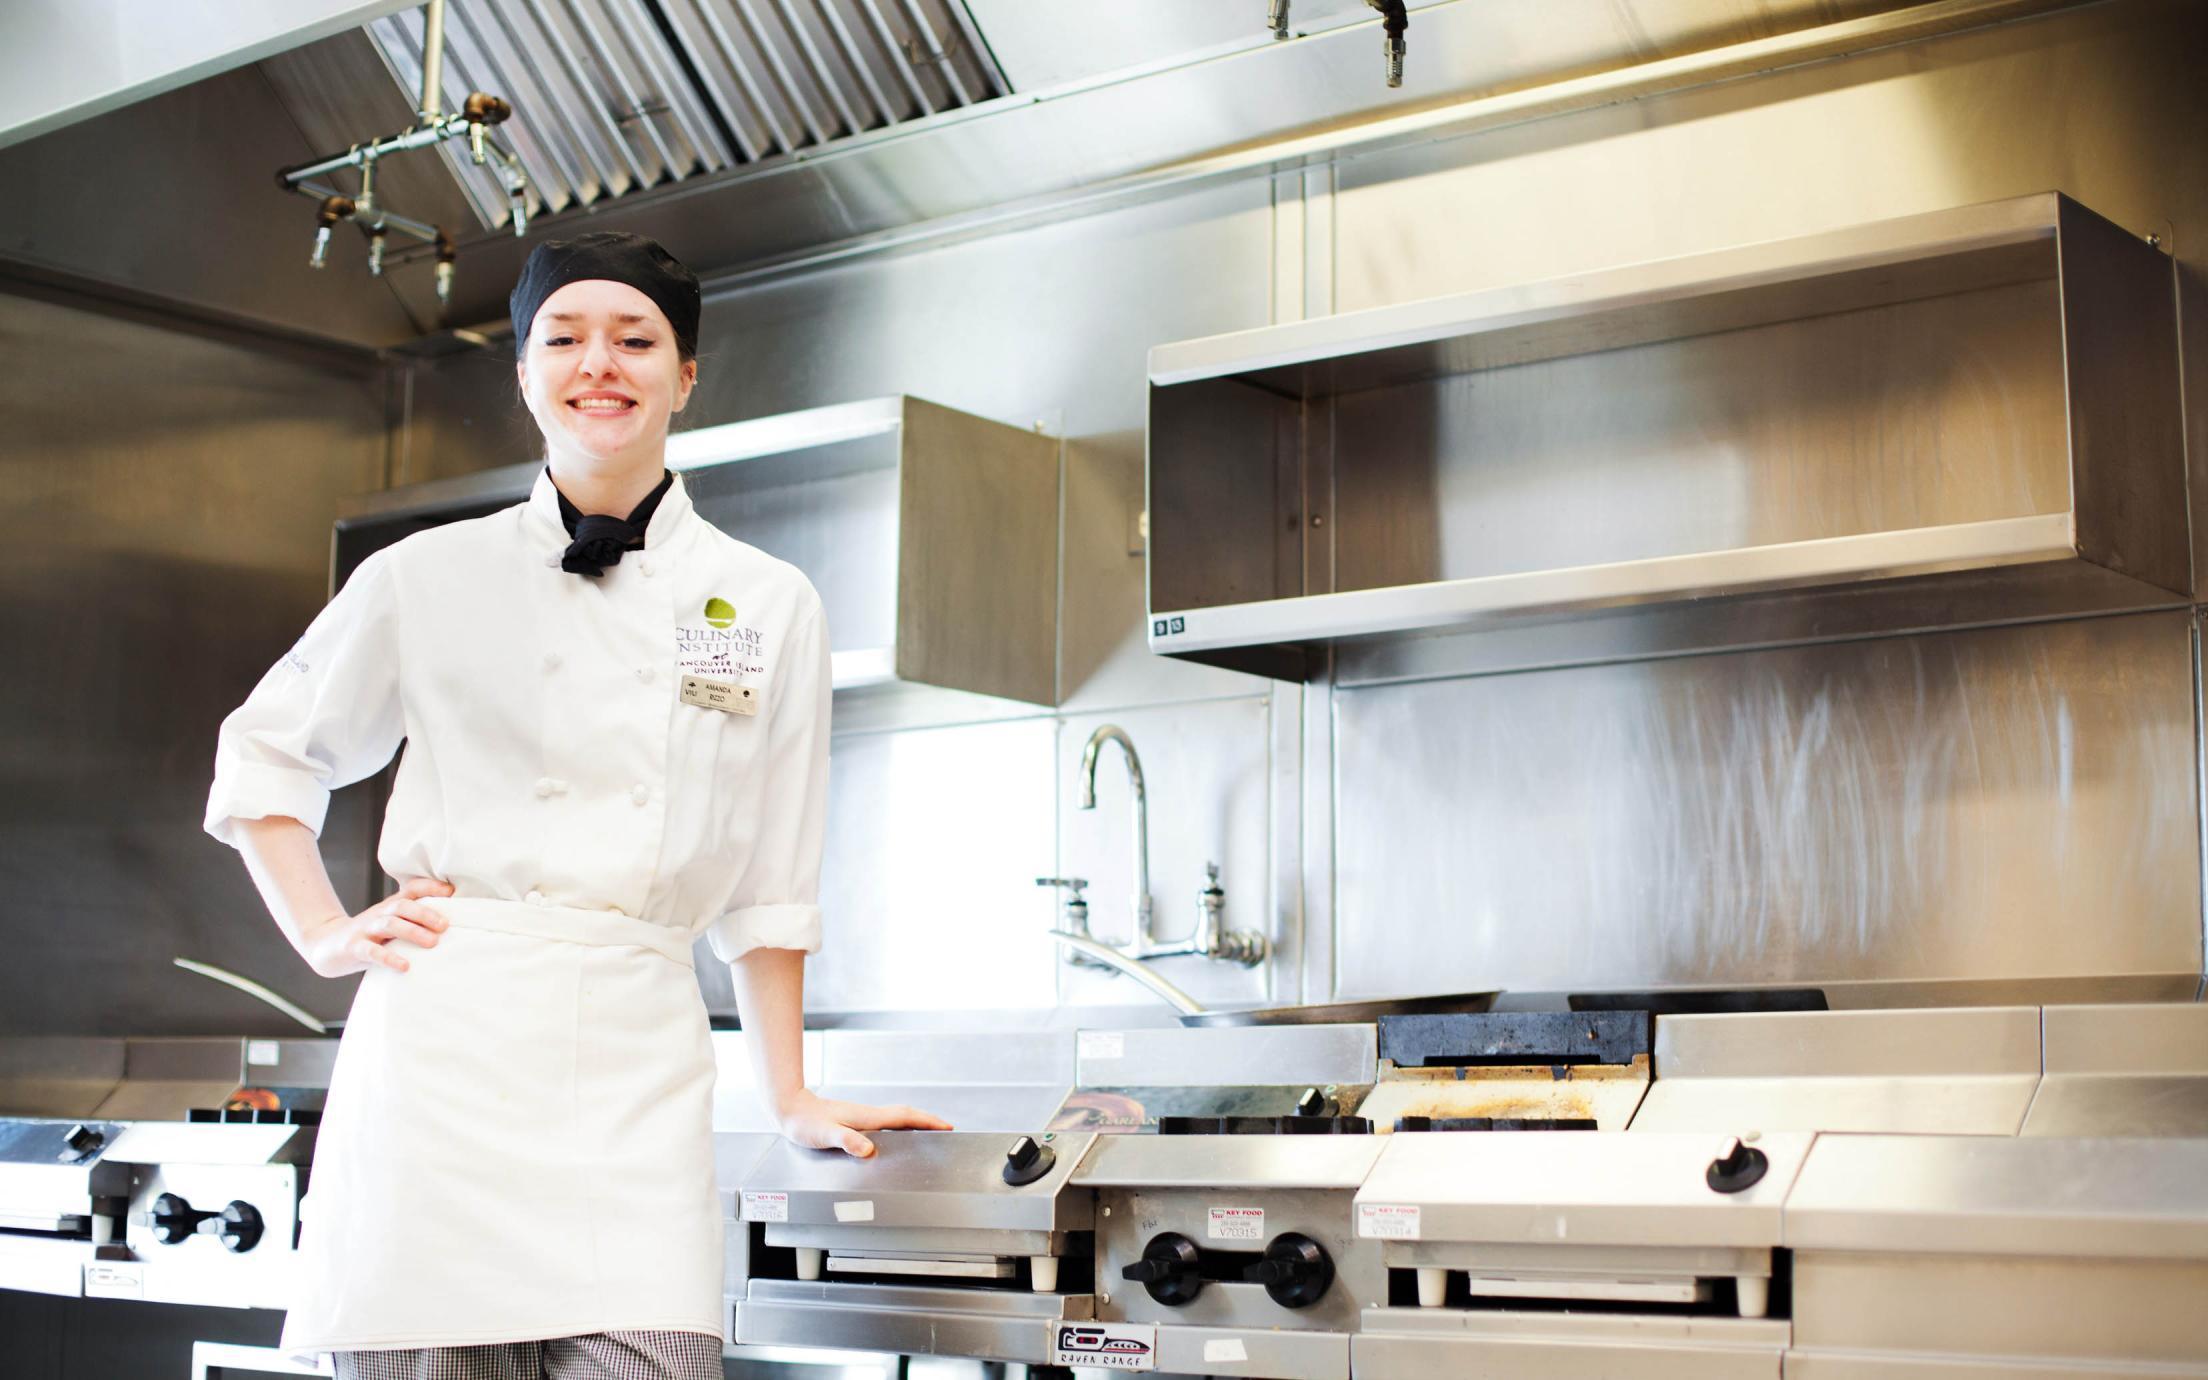 Culinary Management Diploma Student, Amanda Rizzo